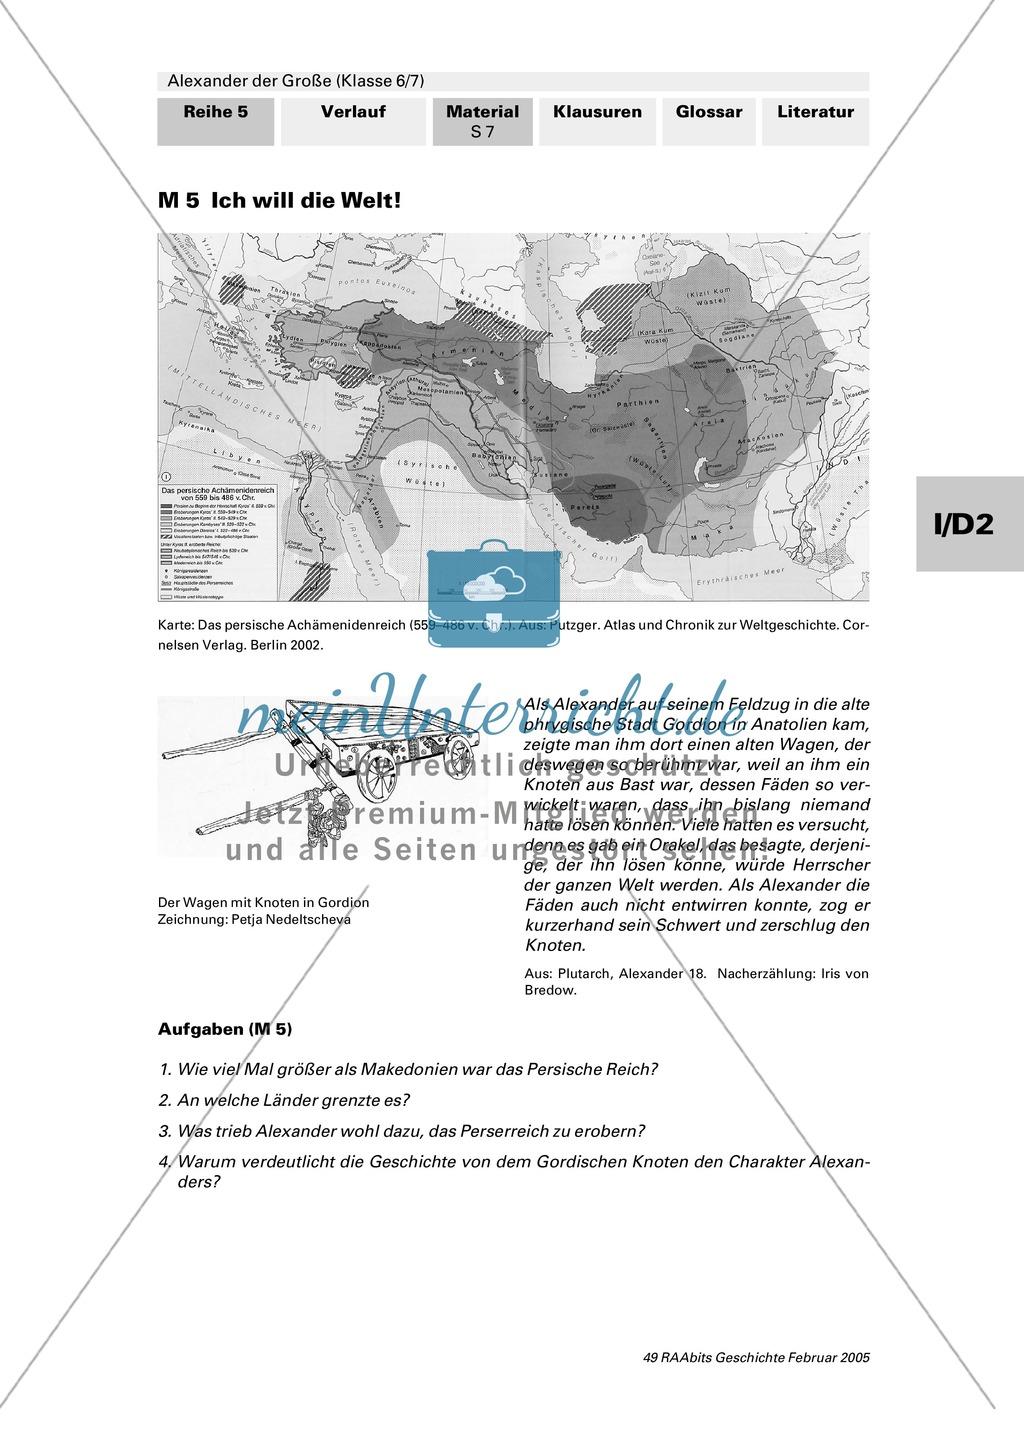 Alexander der Große: Eroberungsfeldzüge an Autorentexten, Karten, Bildern Preview 2